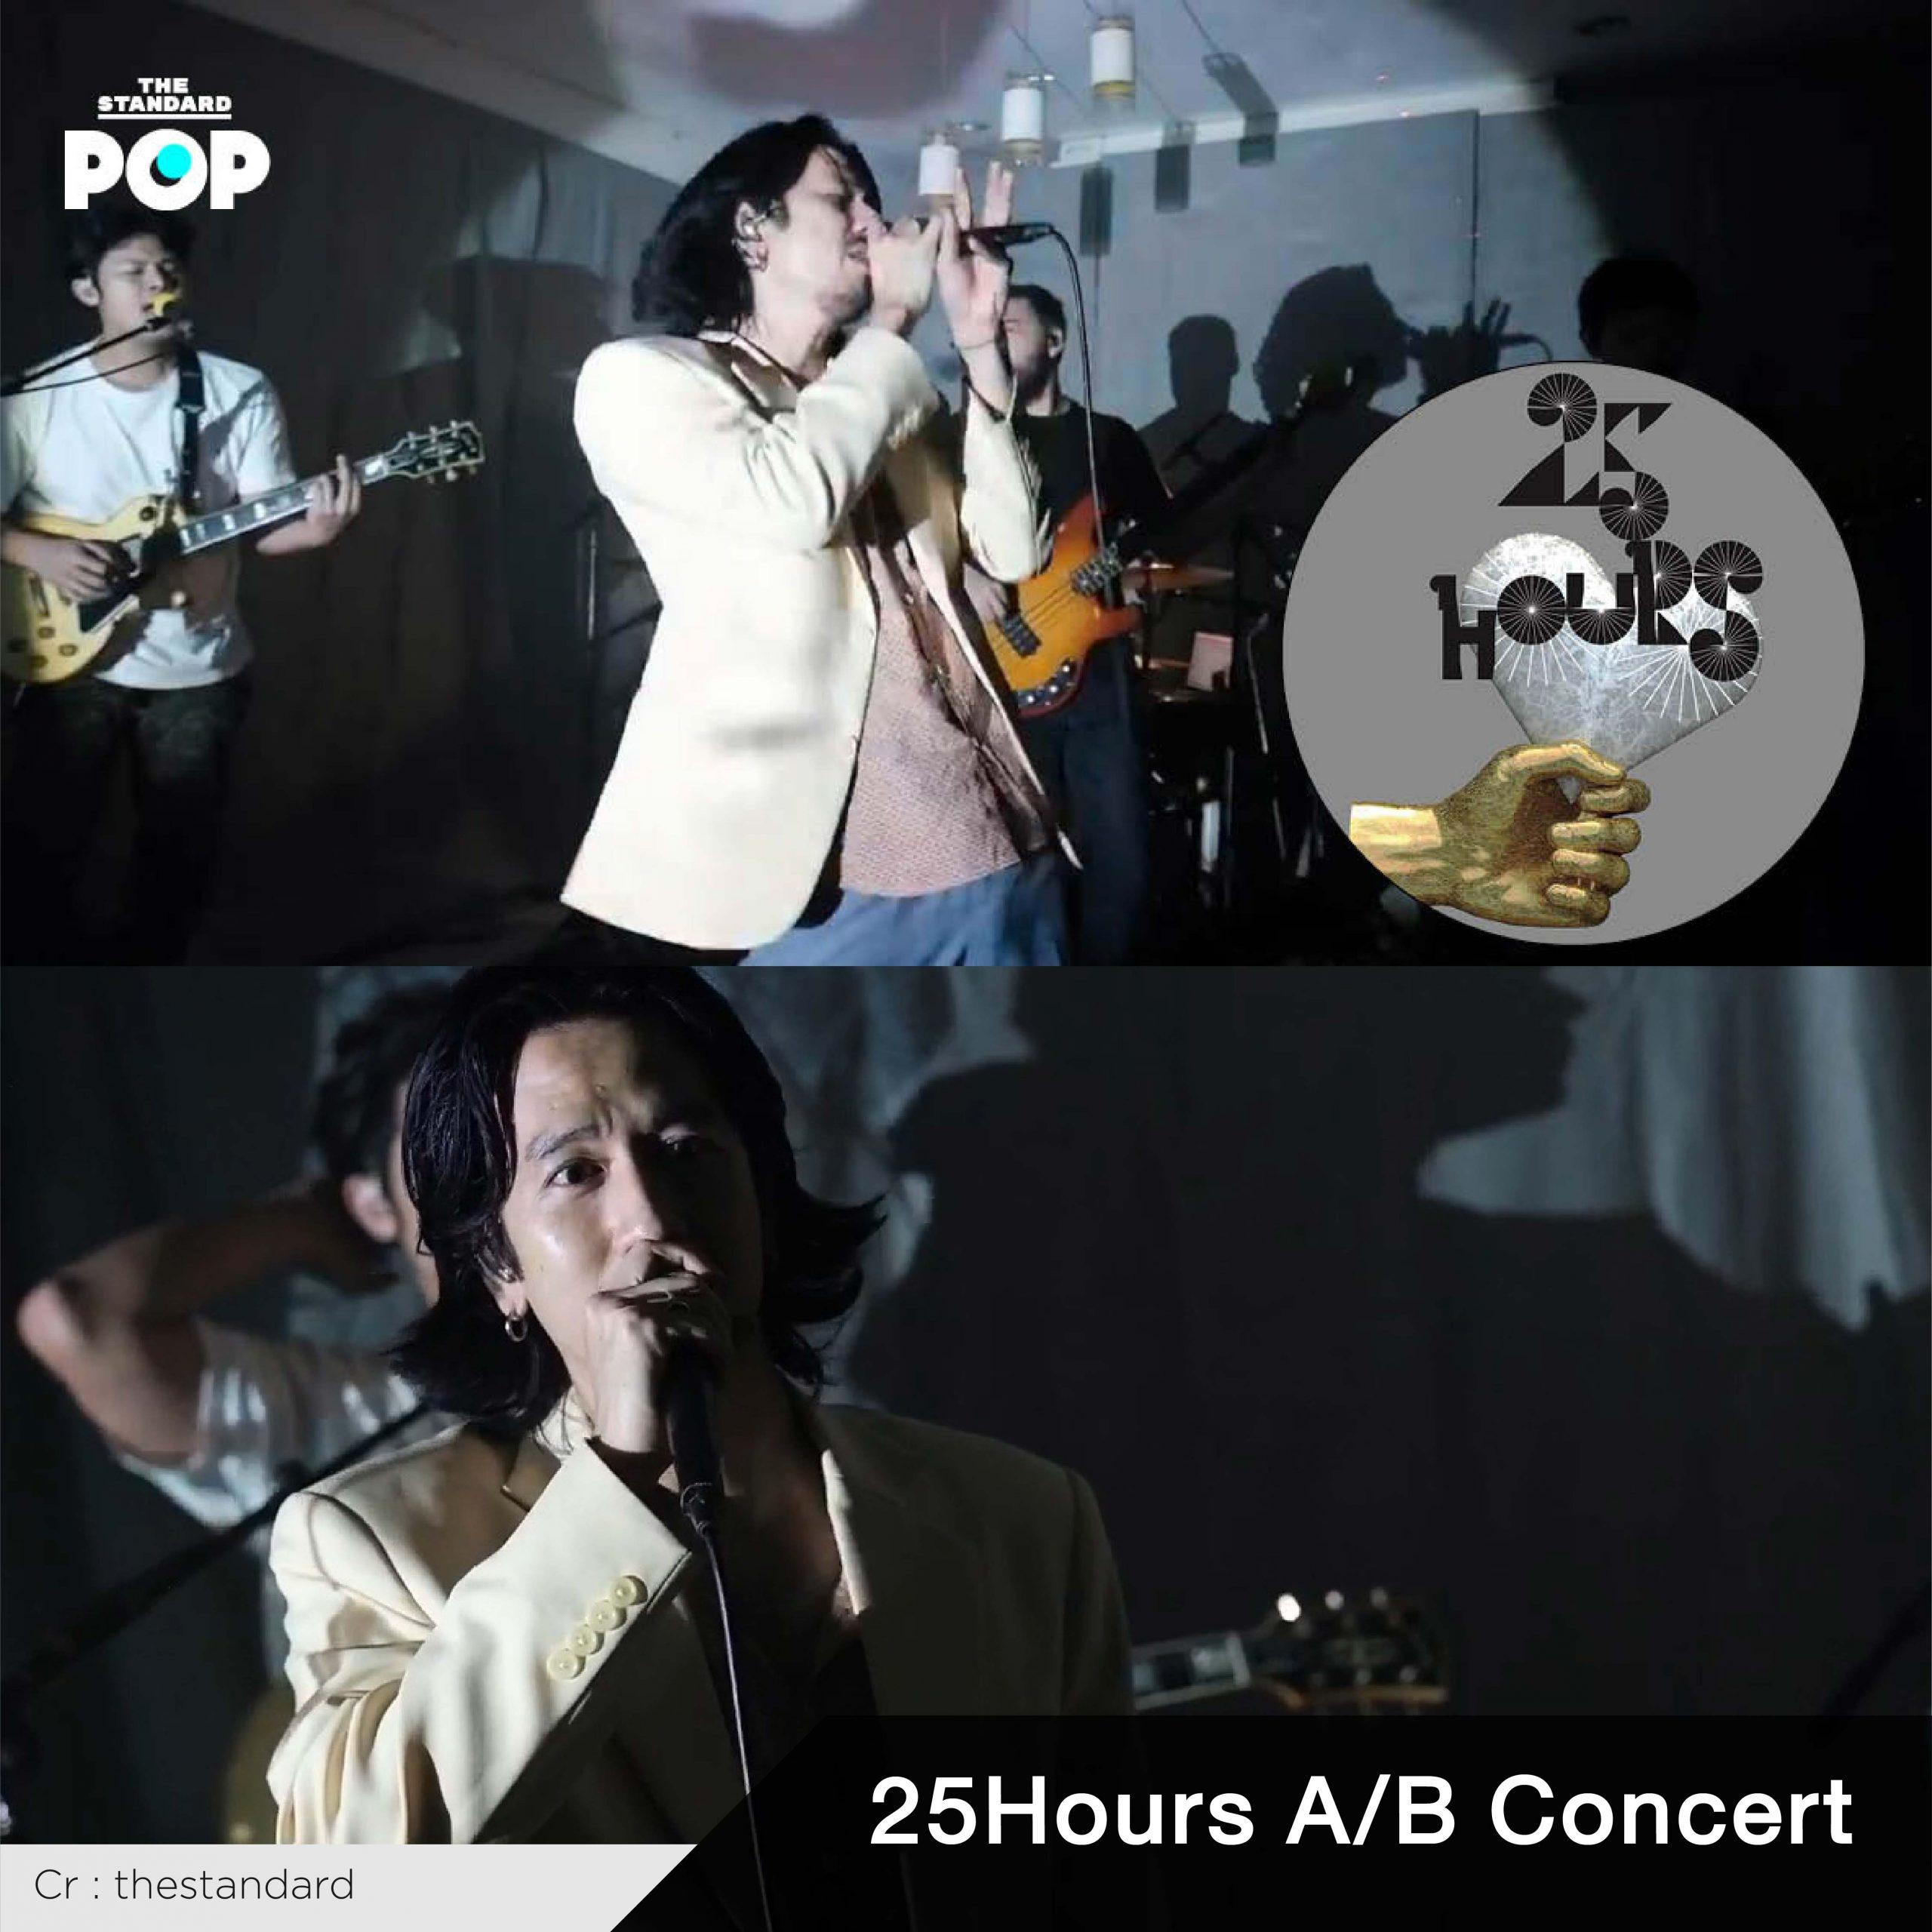 25hours A/B Concert